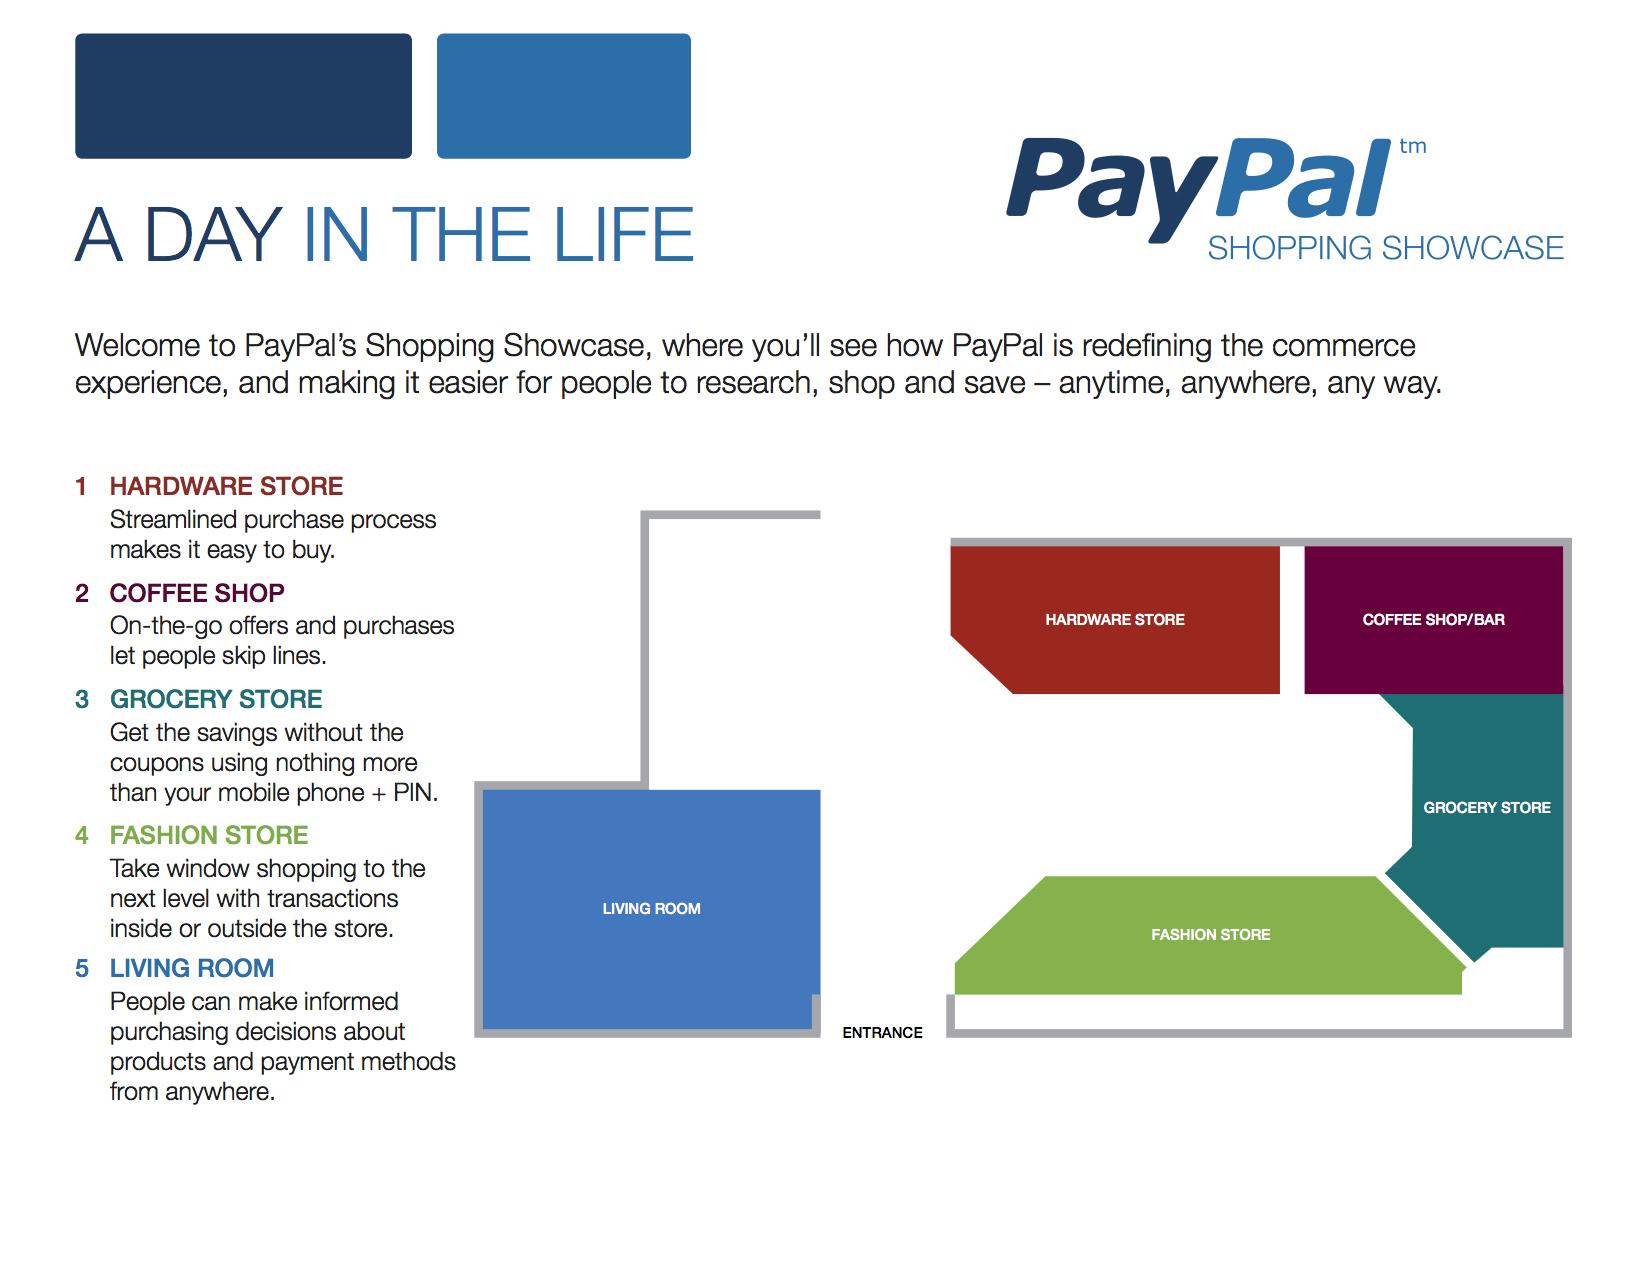 PayPal: Shopping Showcase - San Jose Map (Front)